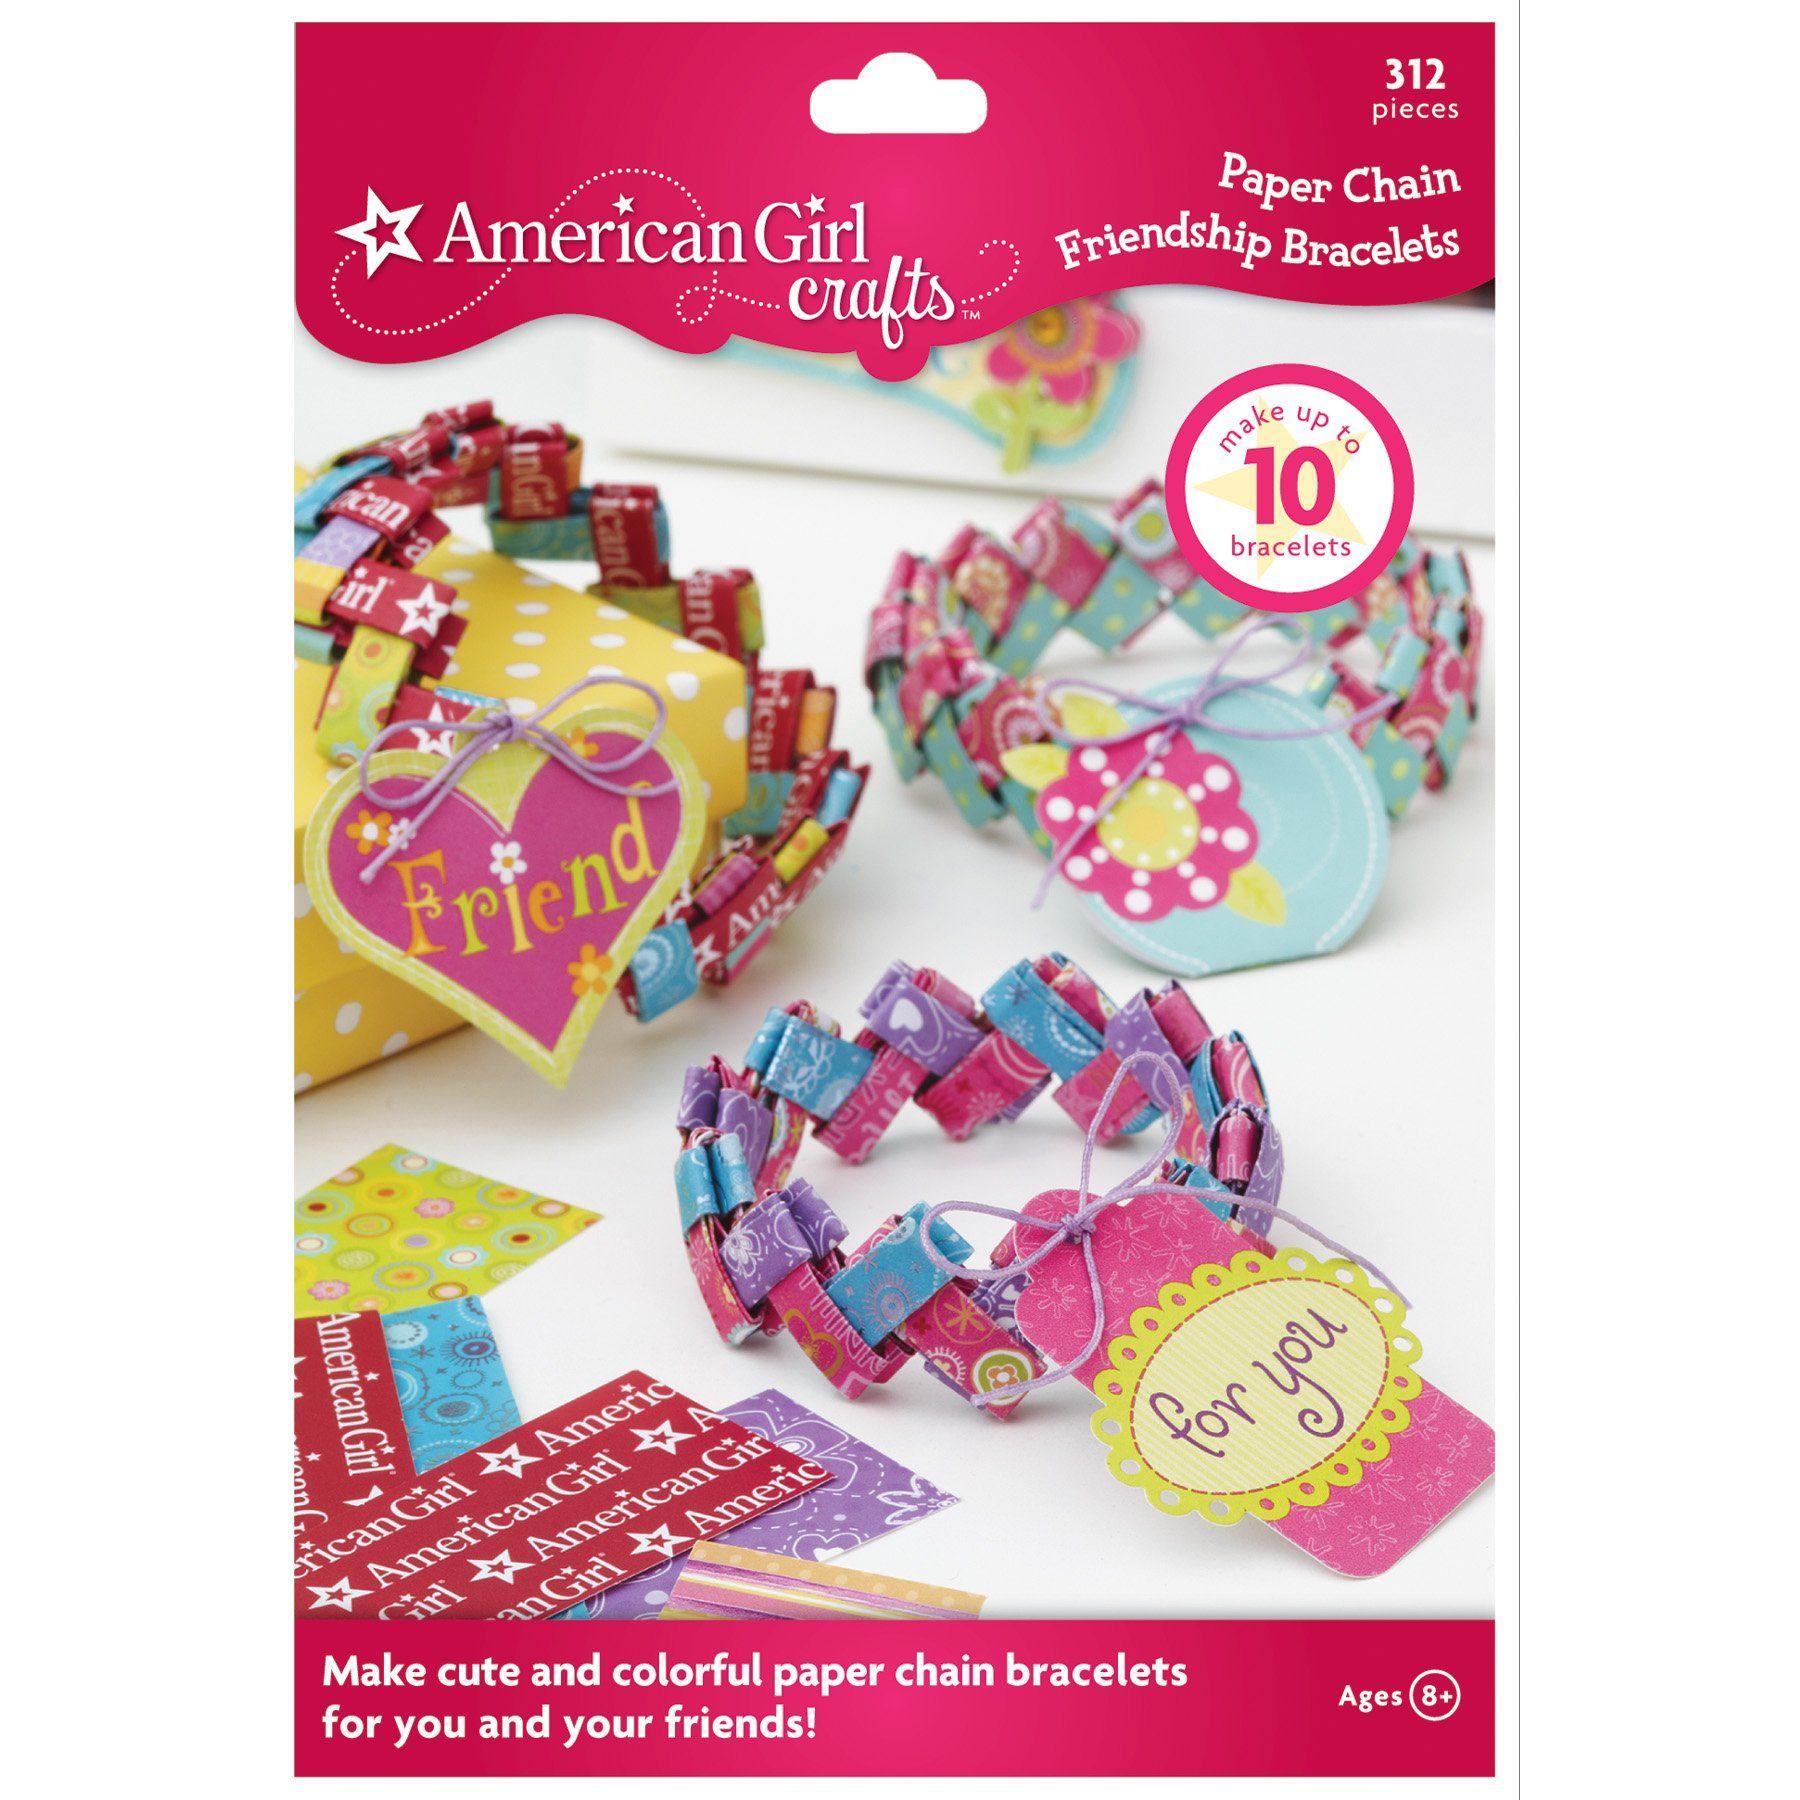 eb4b75053 American Girl Crafts Paper Chain Friendship Bracelet Kit | SC's 9th ...